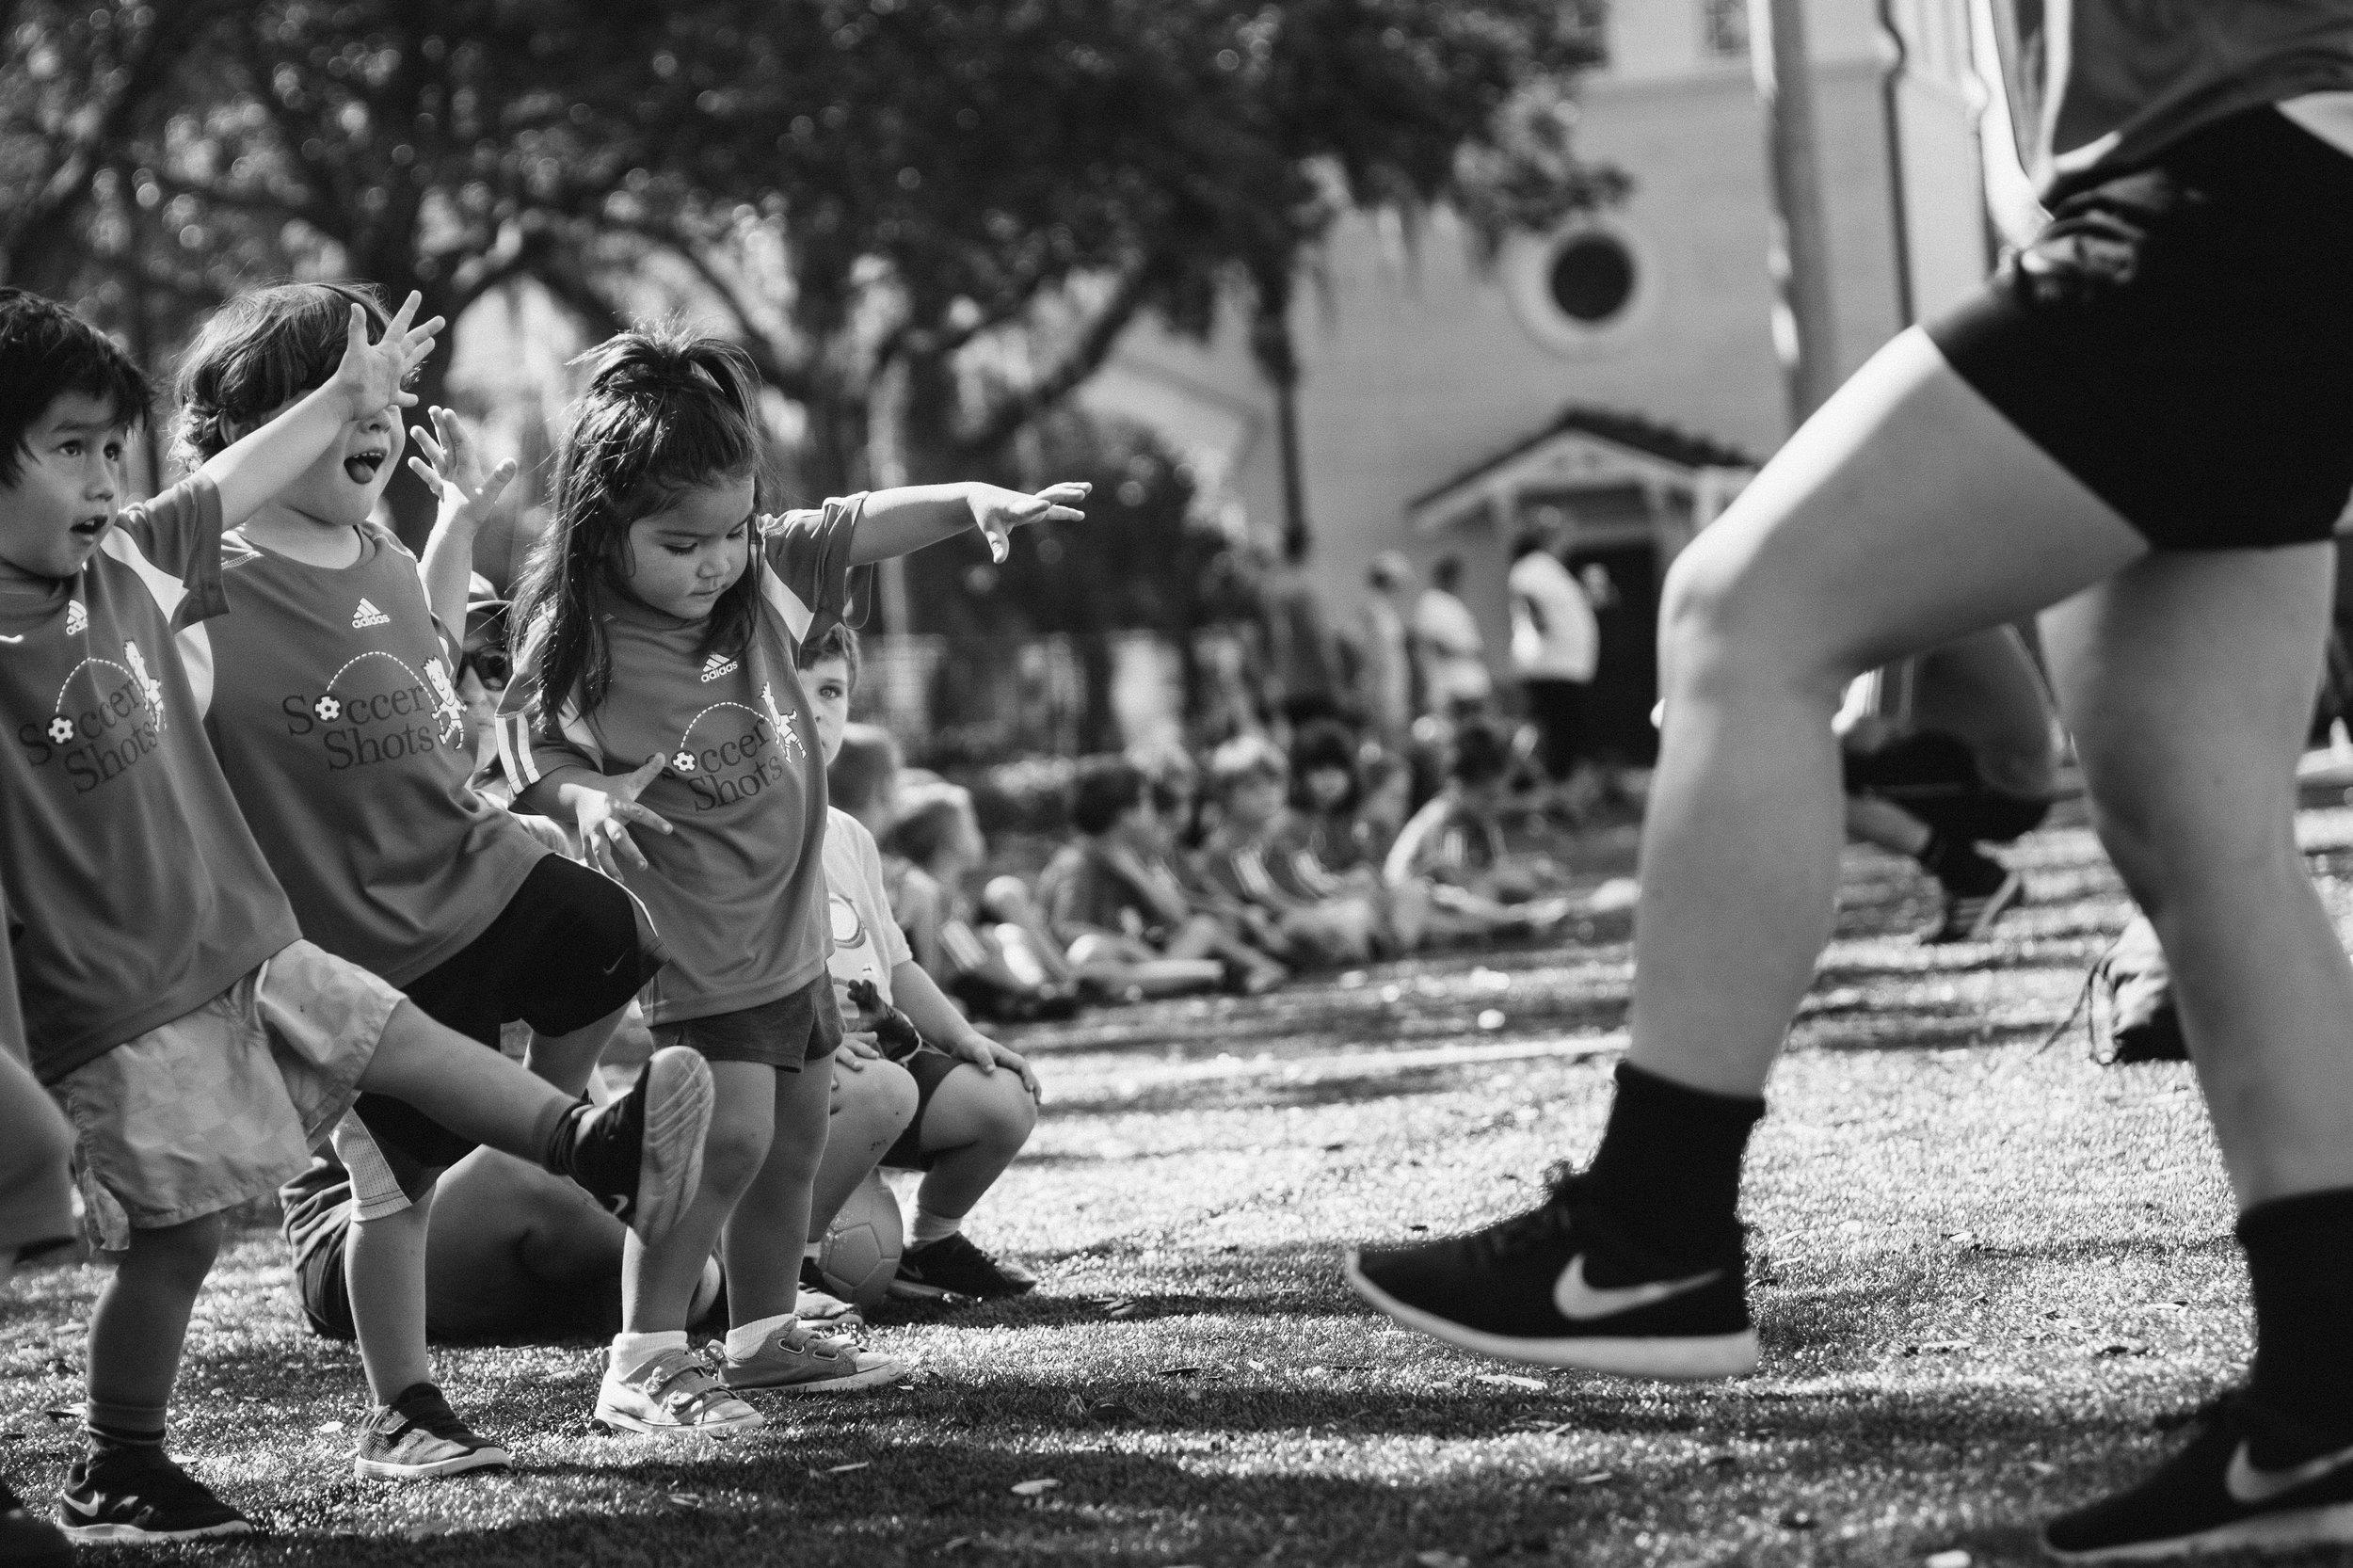 Lola Soccer Shots 2016-0088.jpg